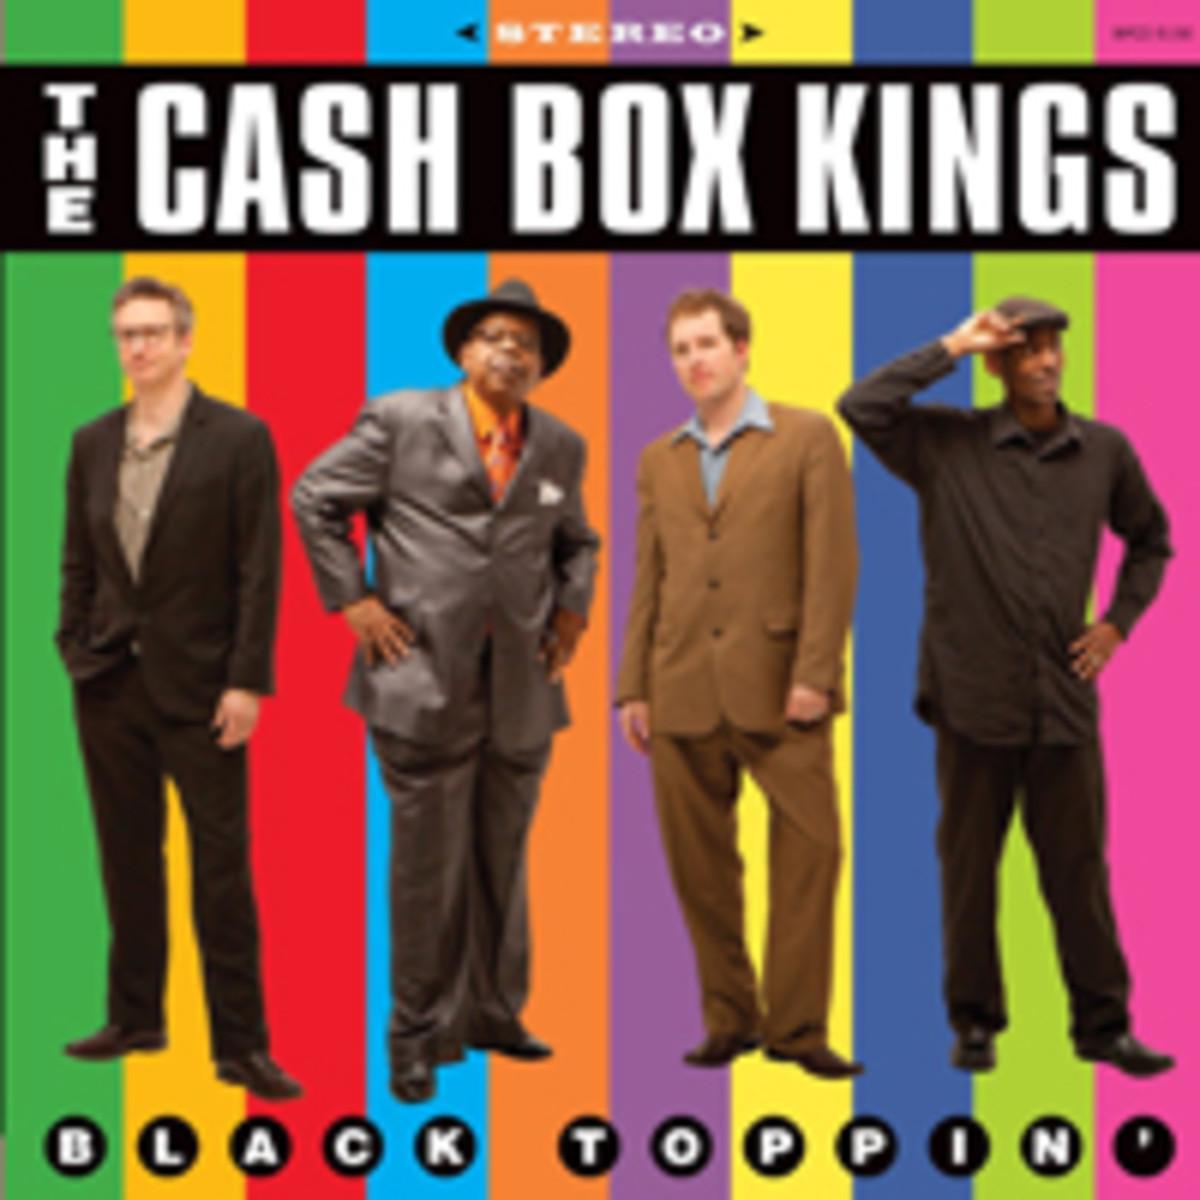 Cash Box Kings Black Toppin